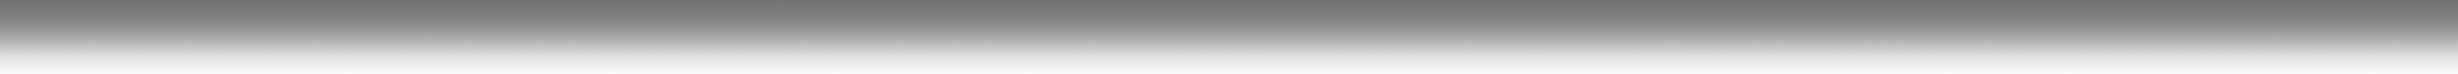 gradient-55.png